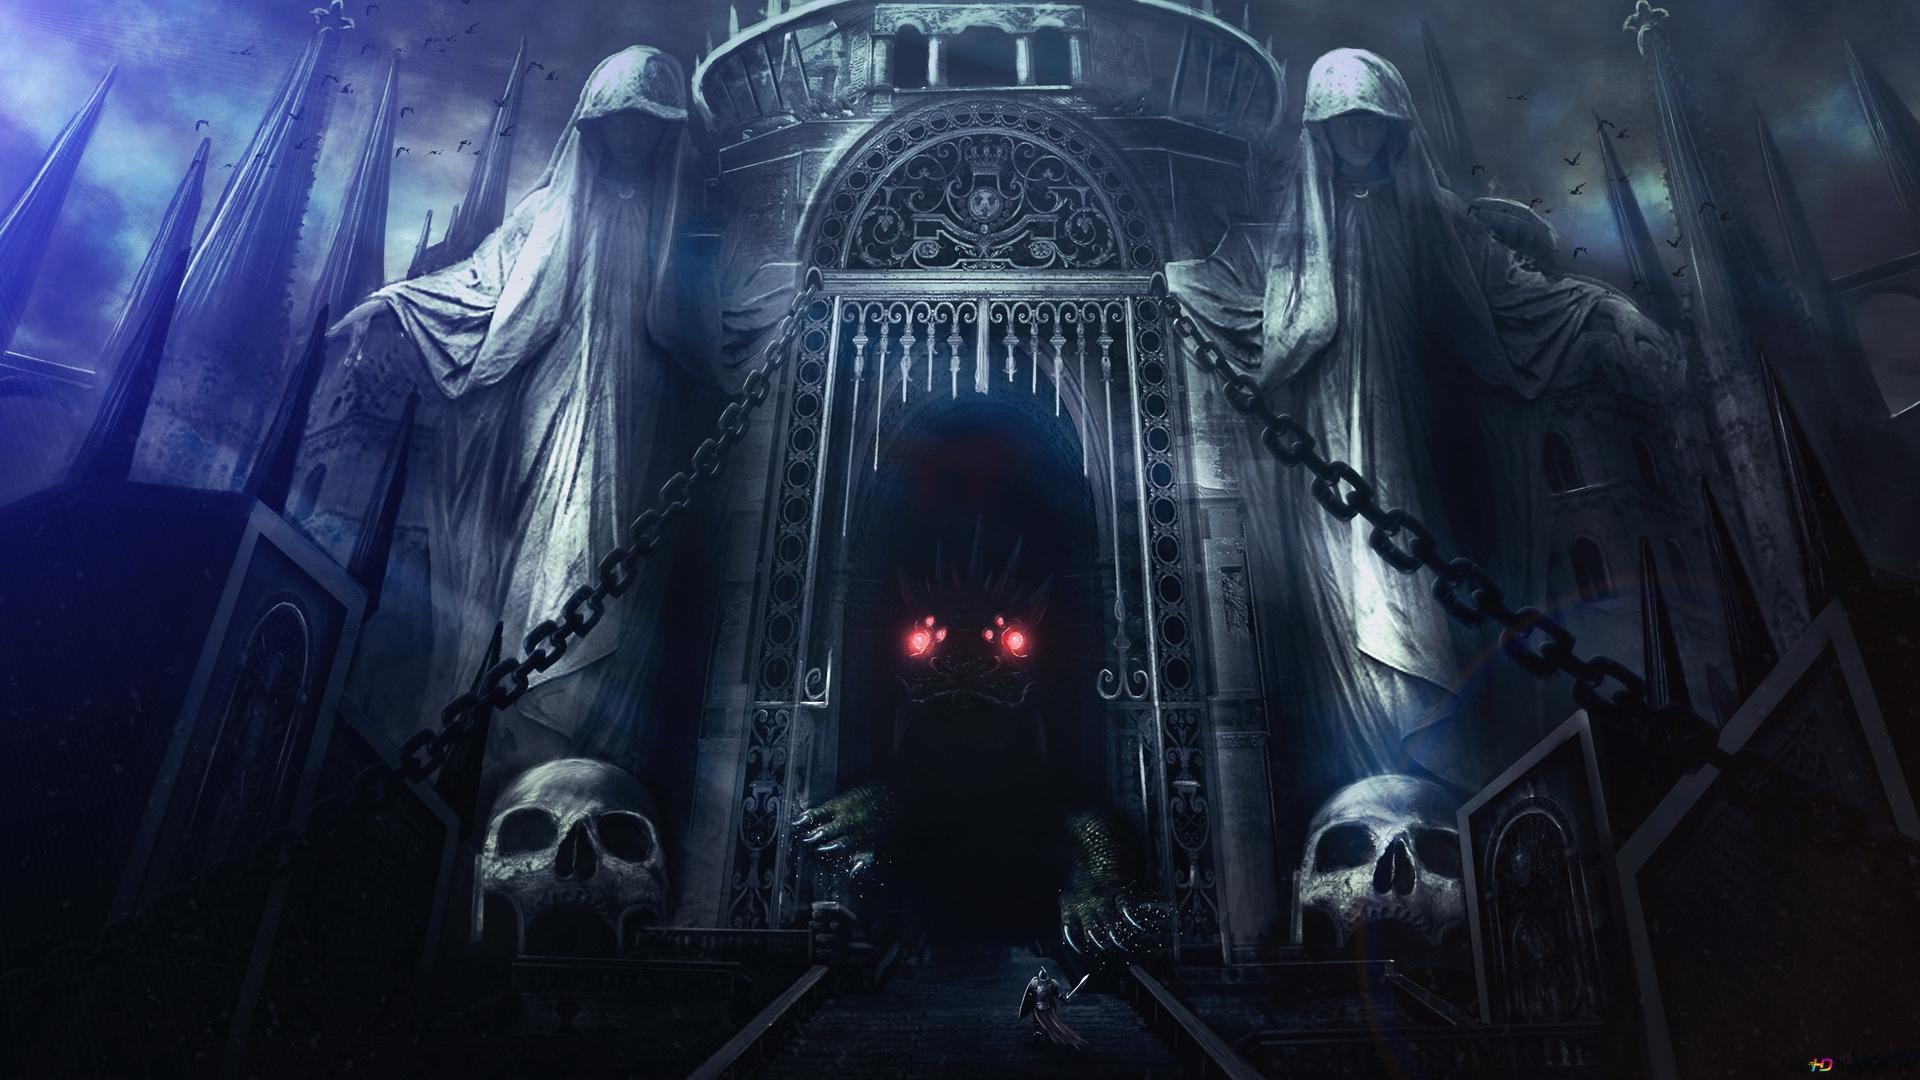 Dark Souls 2 Game Monster In The Dark Castle Hd Wallpaper Download